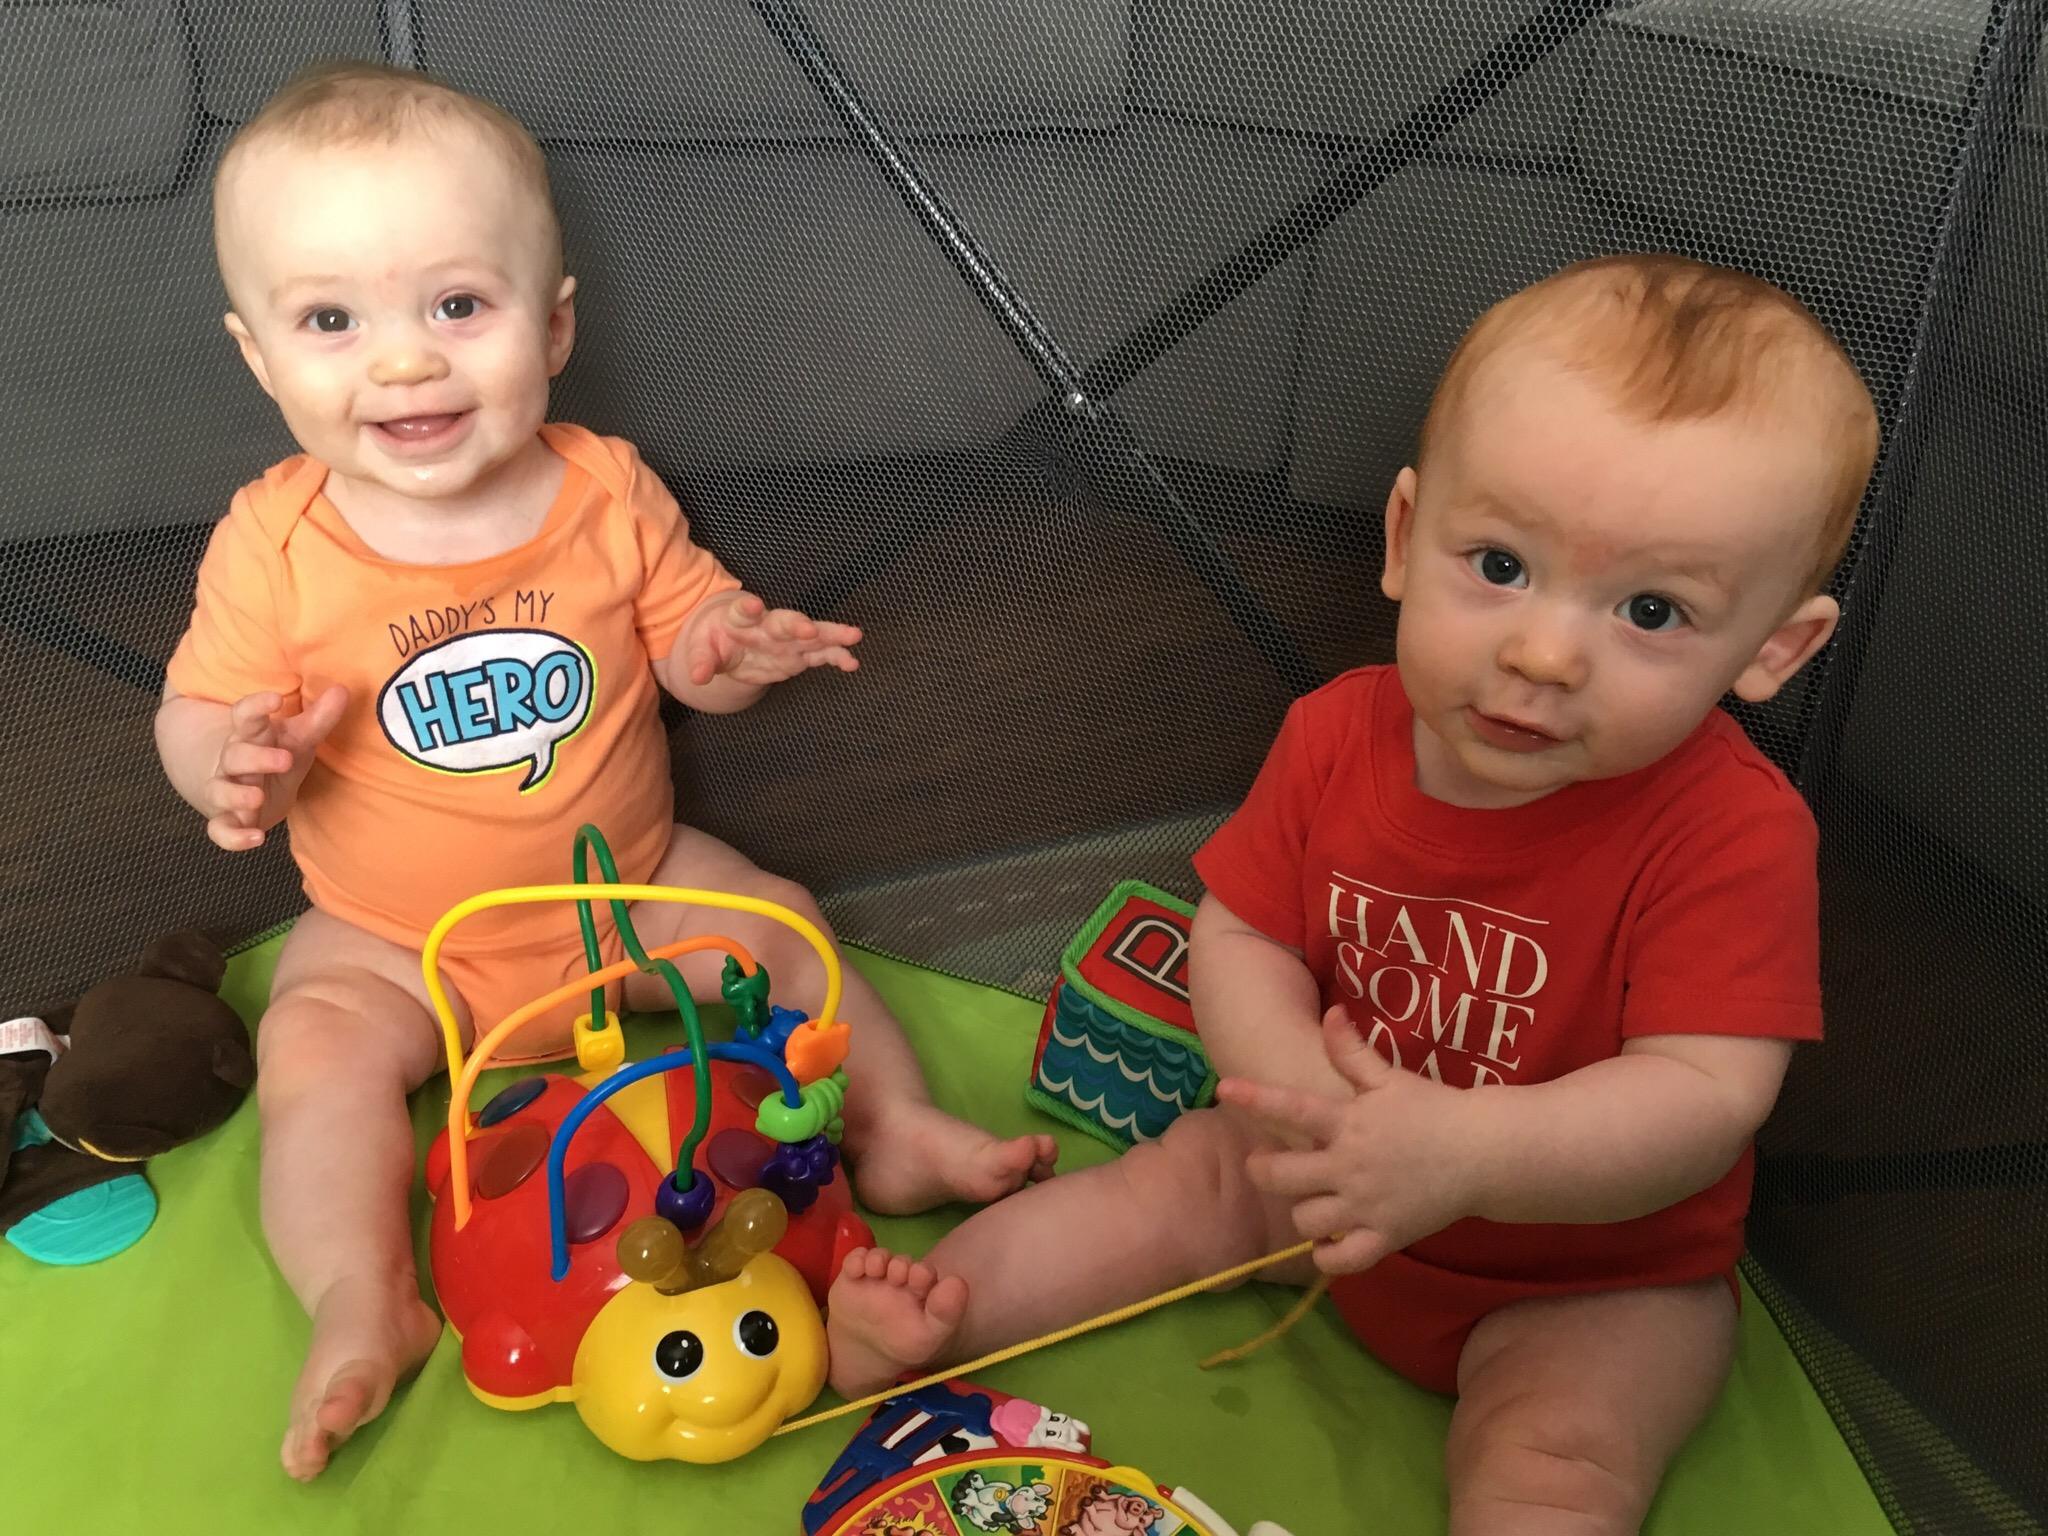 Julian & Joshua, 7 months old, sporting their Daddy shirts